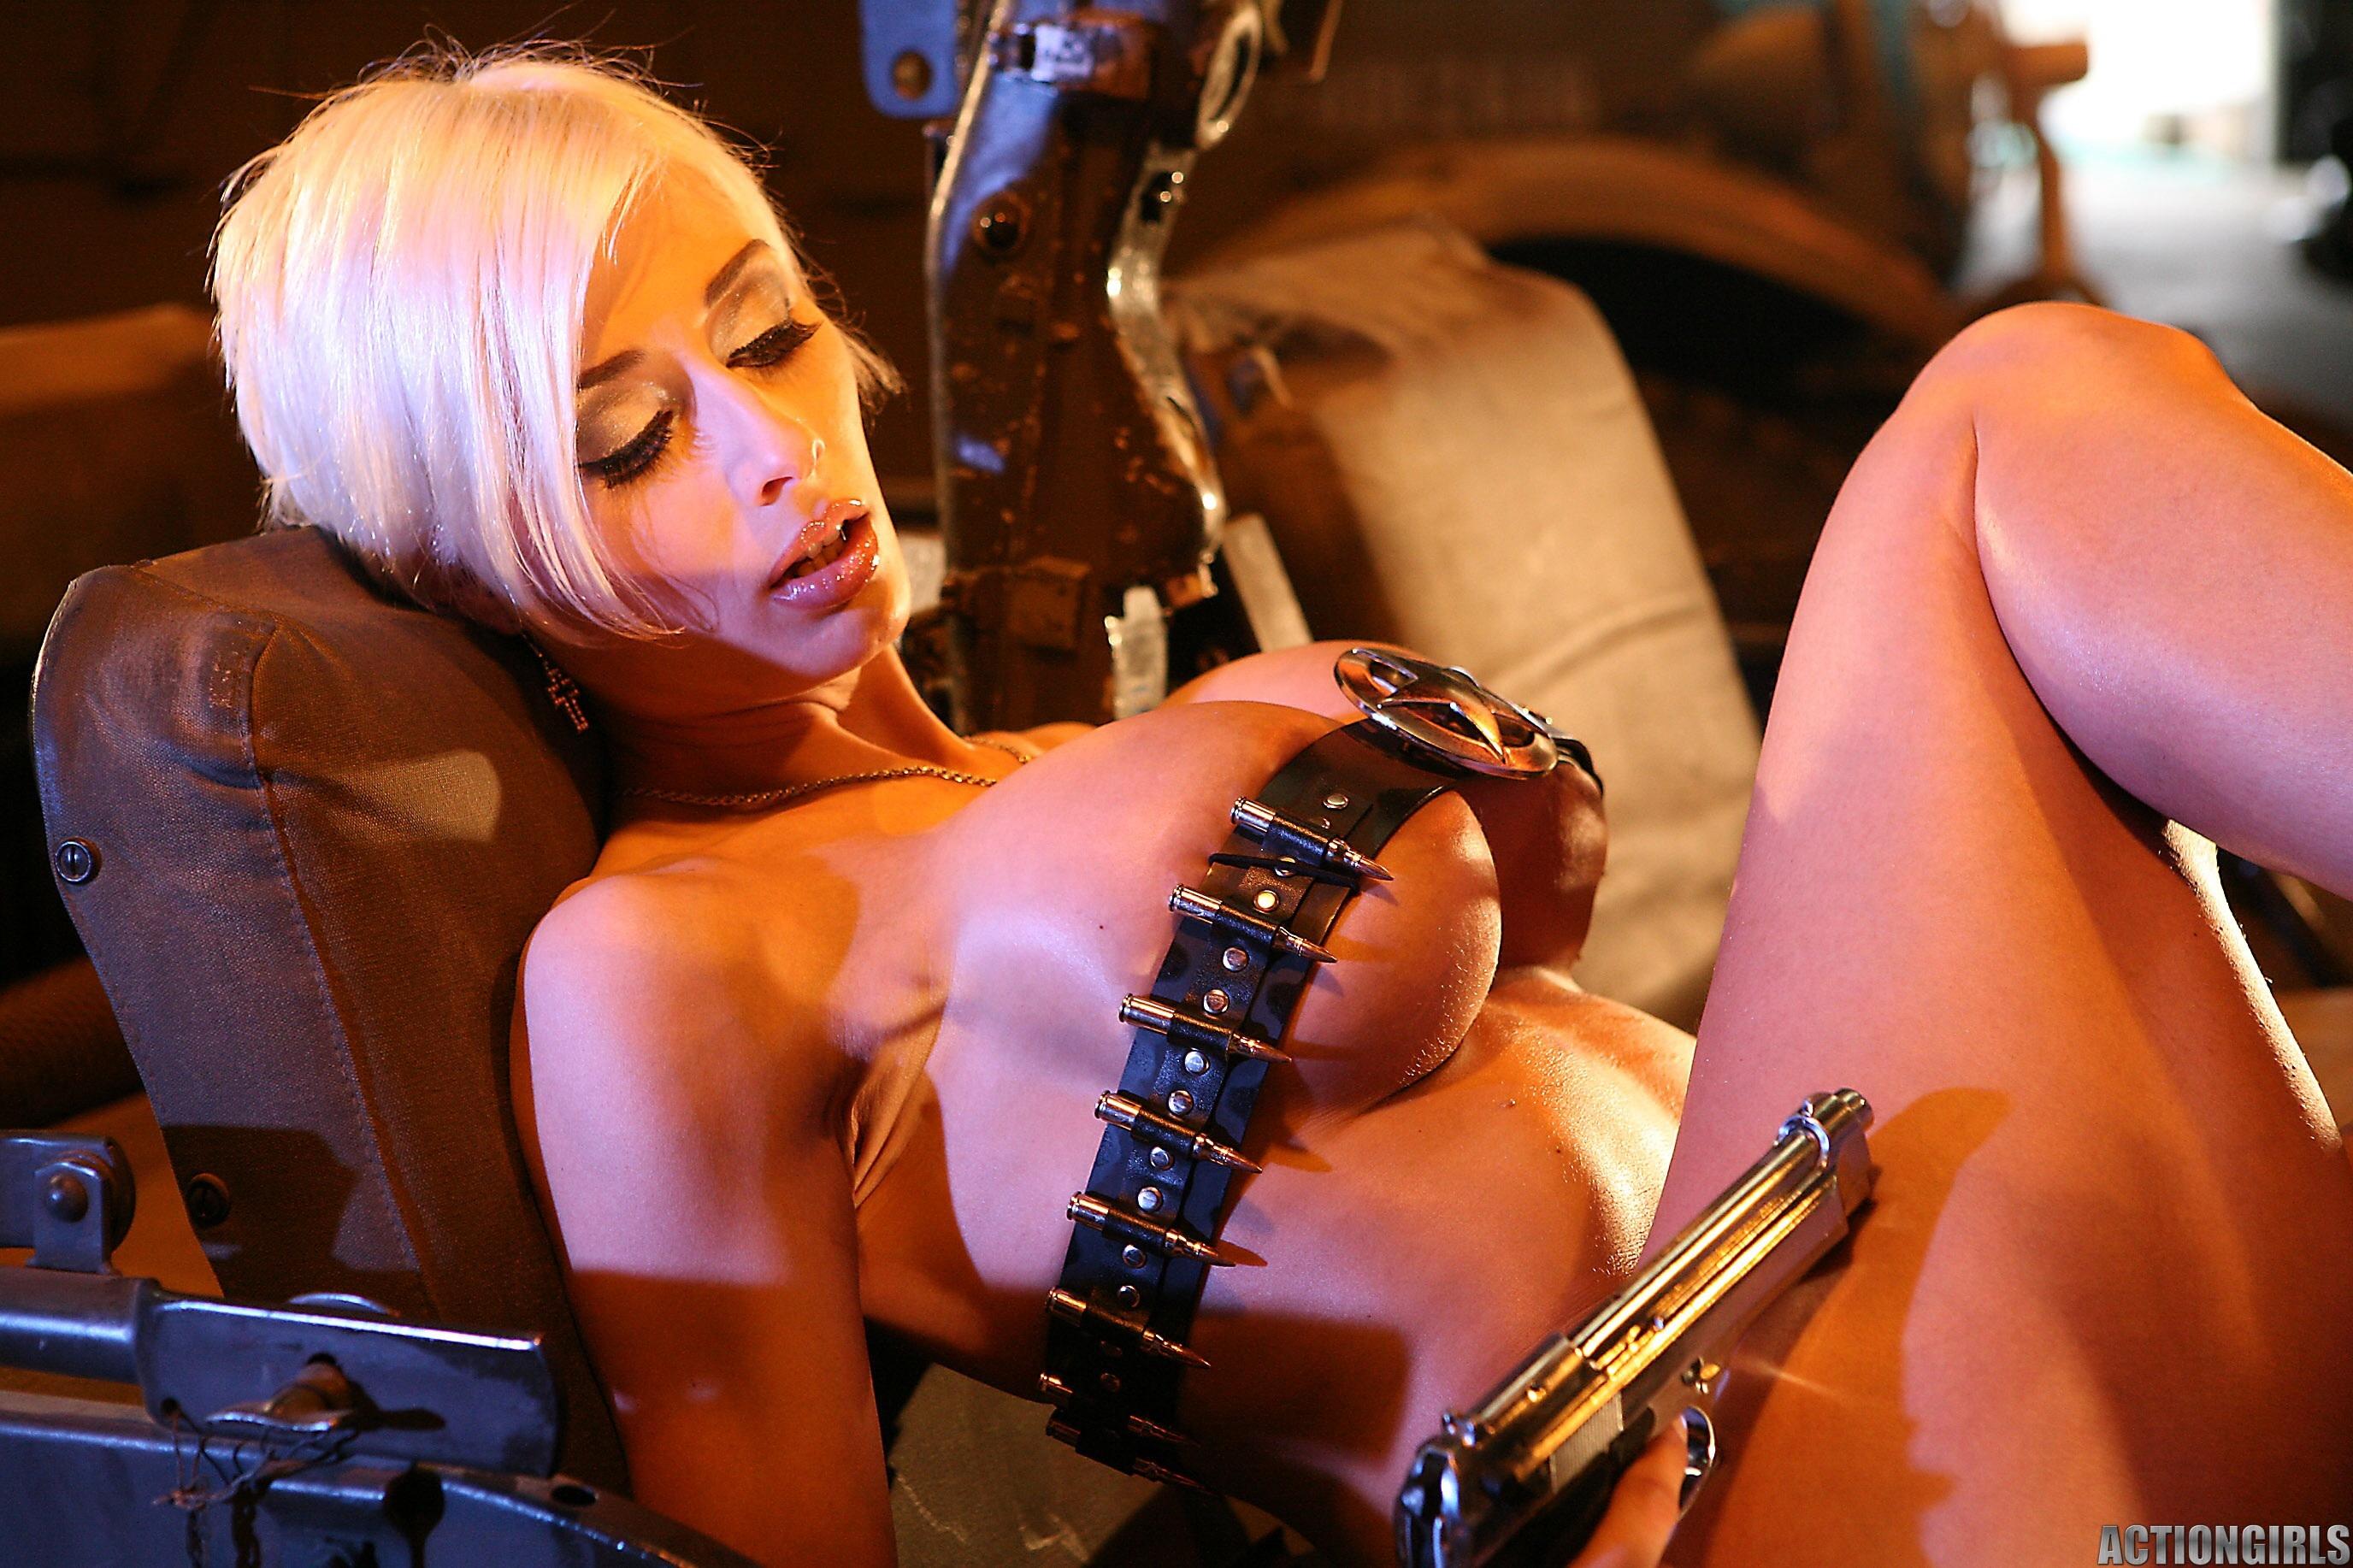 girl with guns xxx